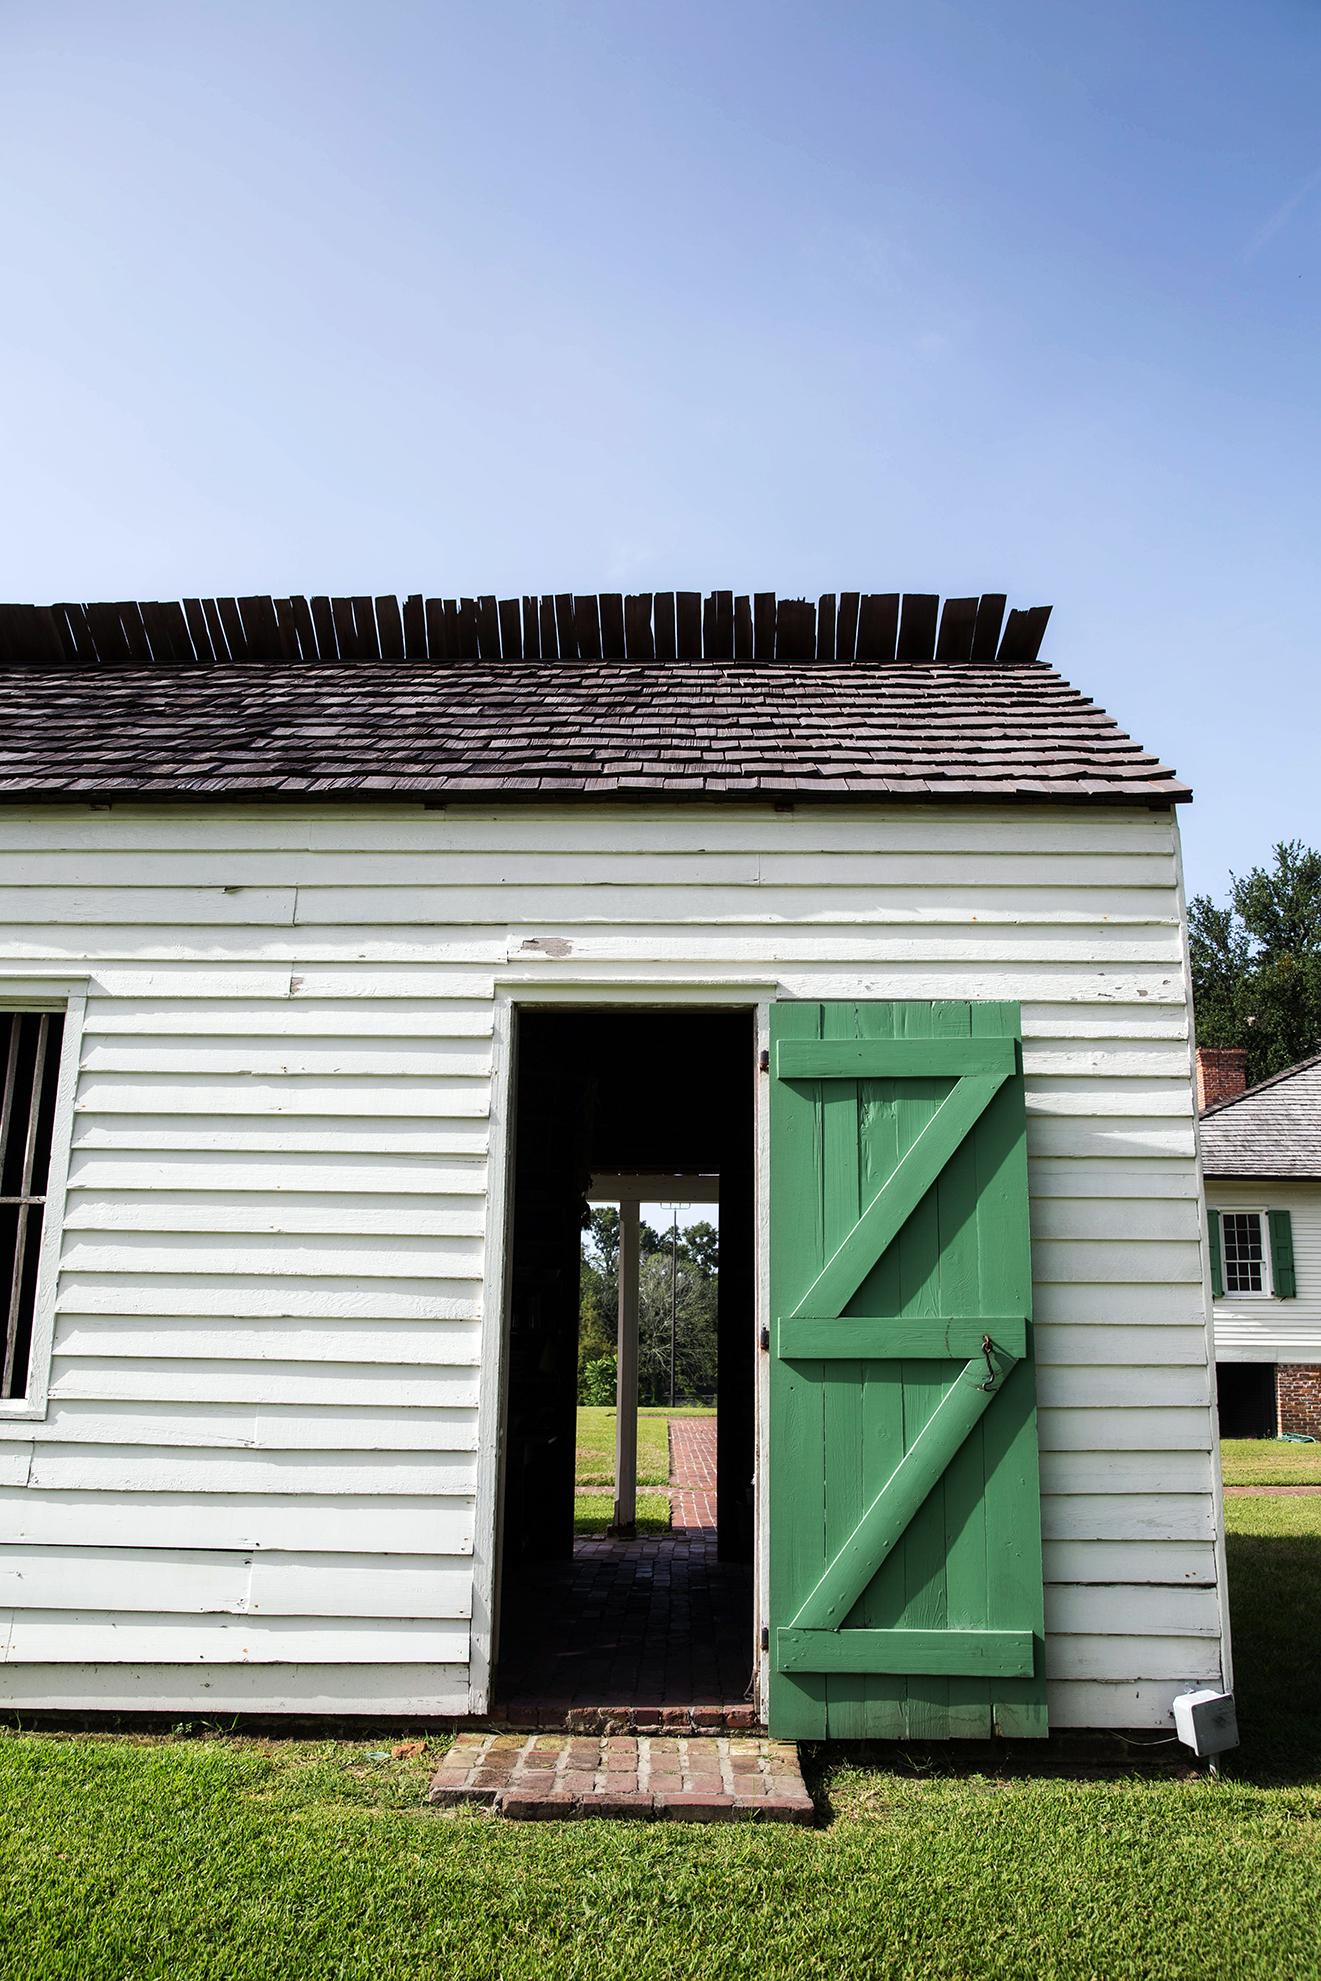 Local African-American history landmarks - 225